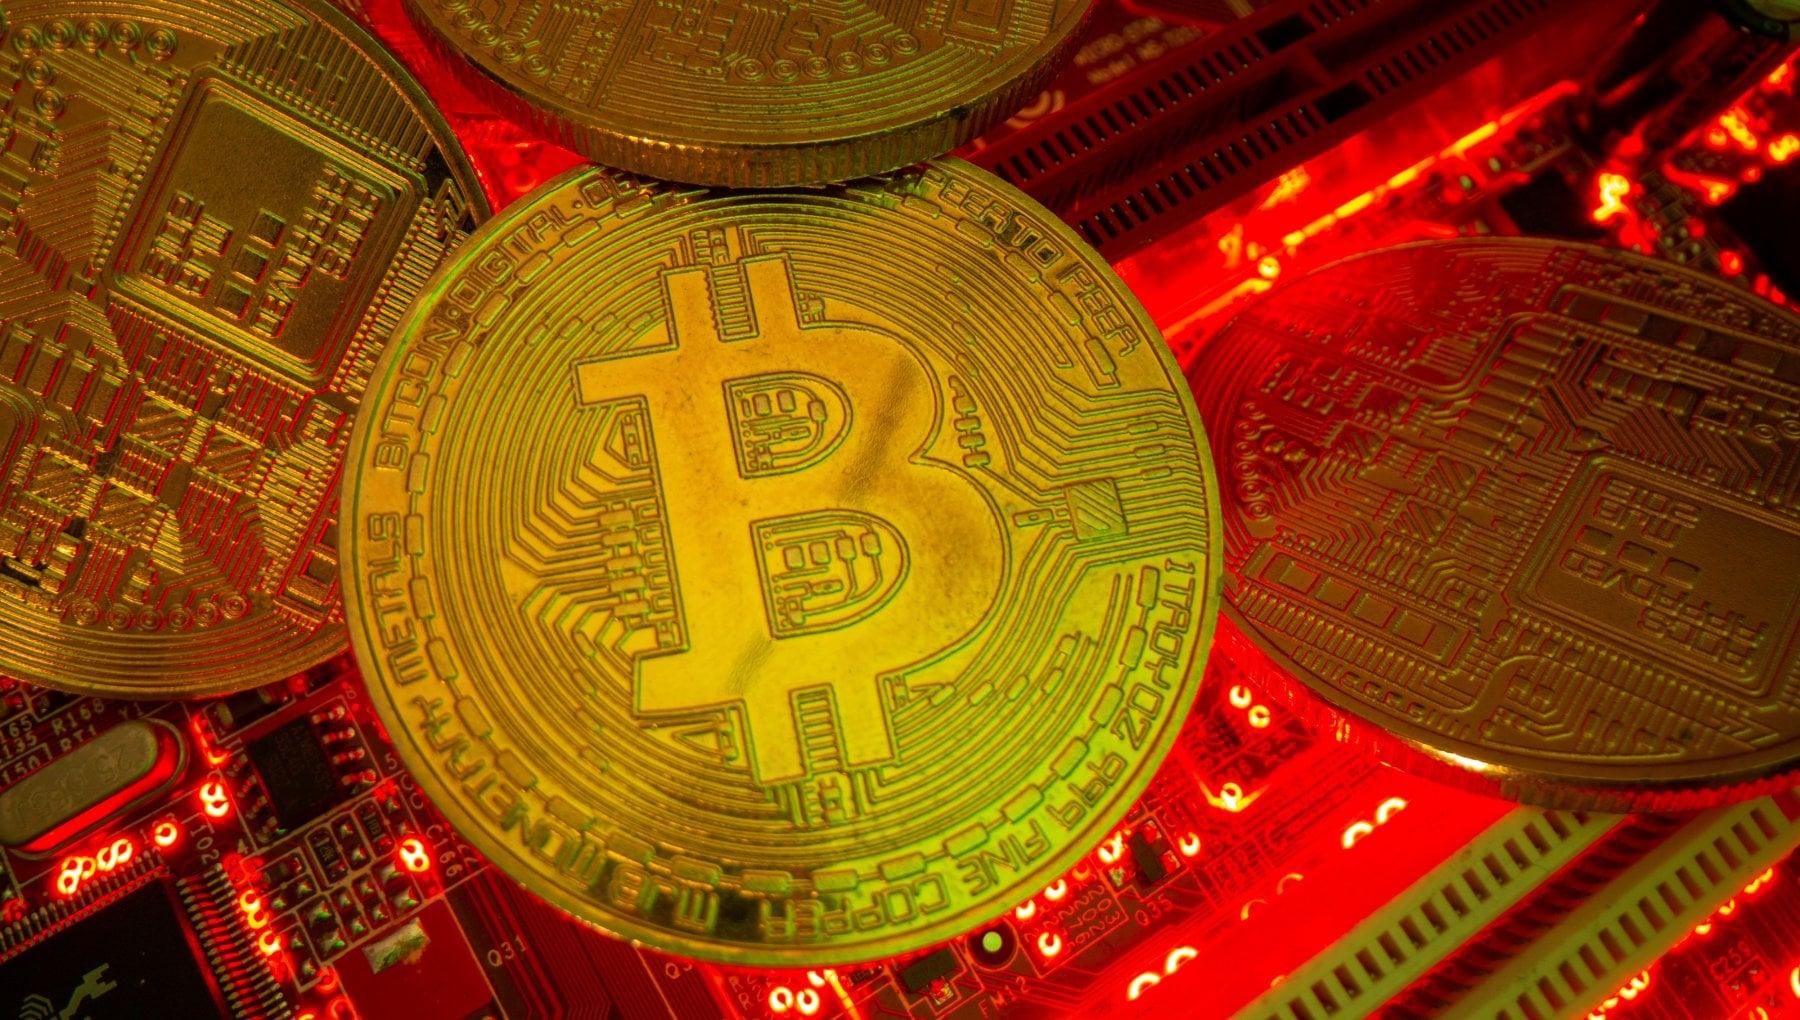 crollo bitcoin 18 aprile 2021 corso blockchain gratis